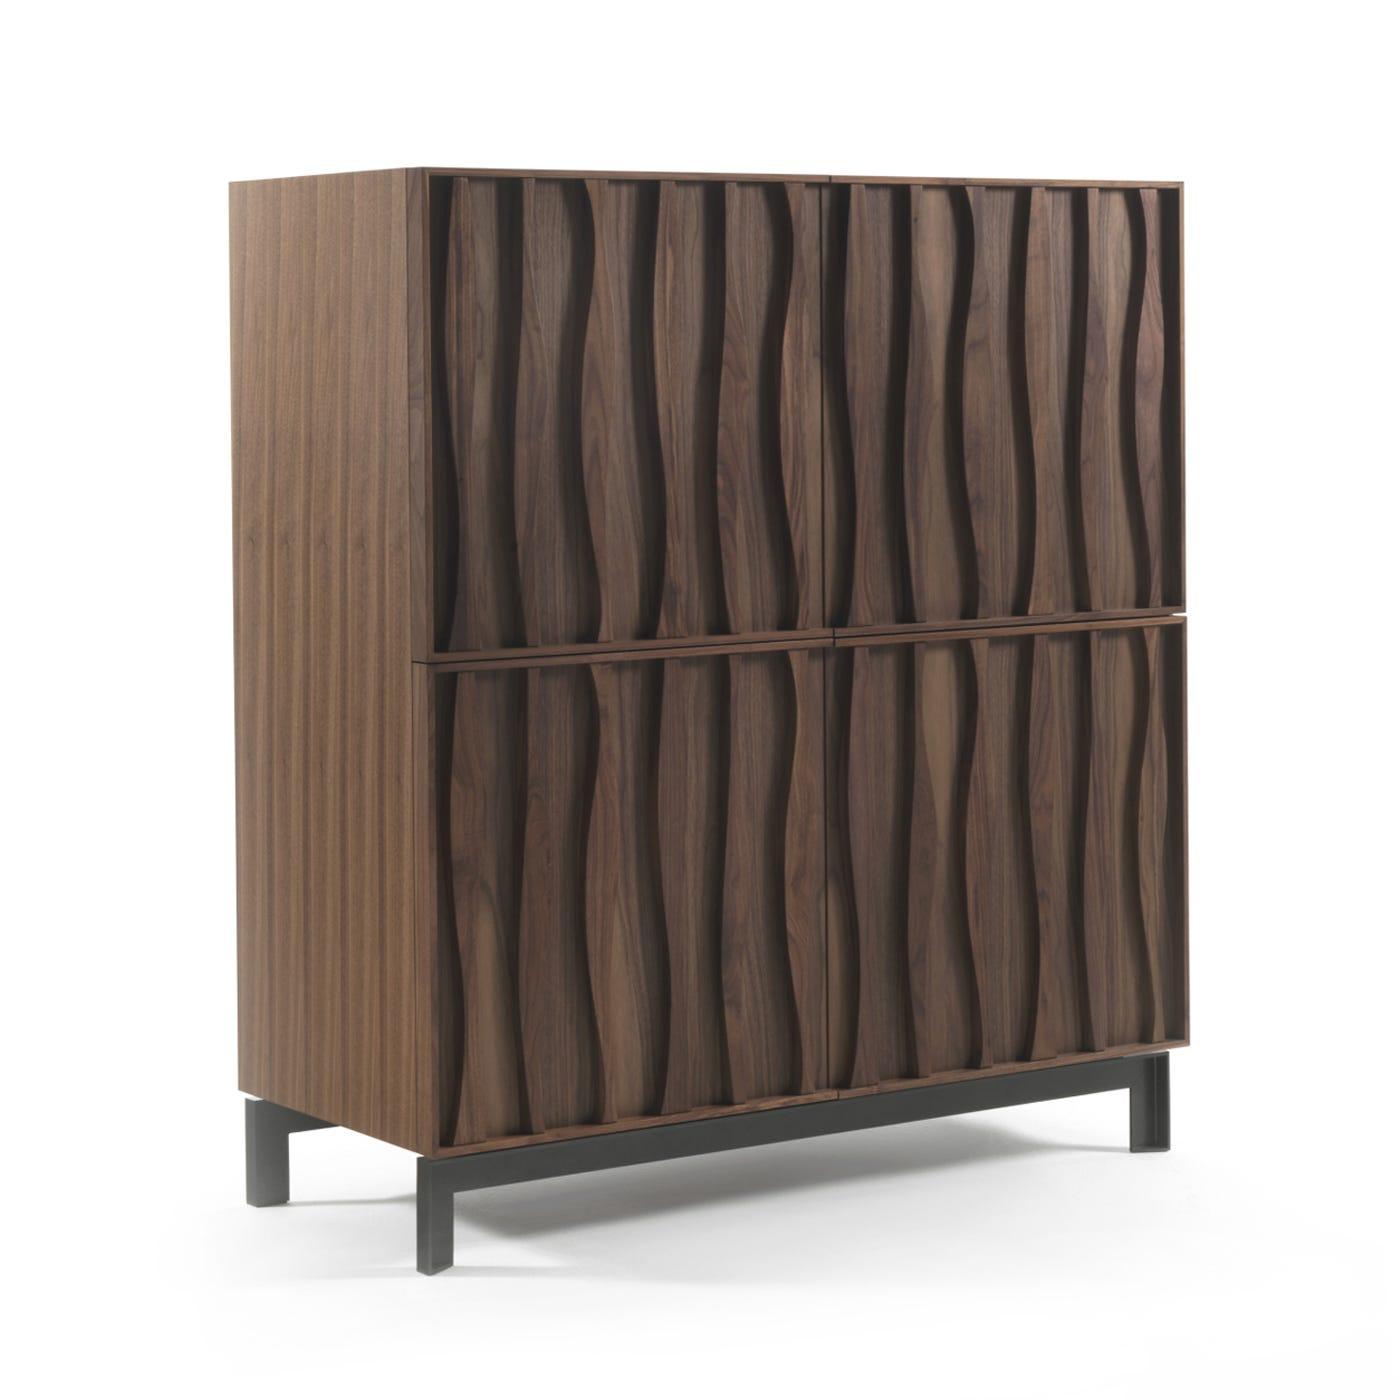 Masai 4 Door Cabinet Caneletta Walnut Metal Base